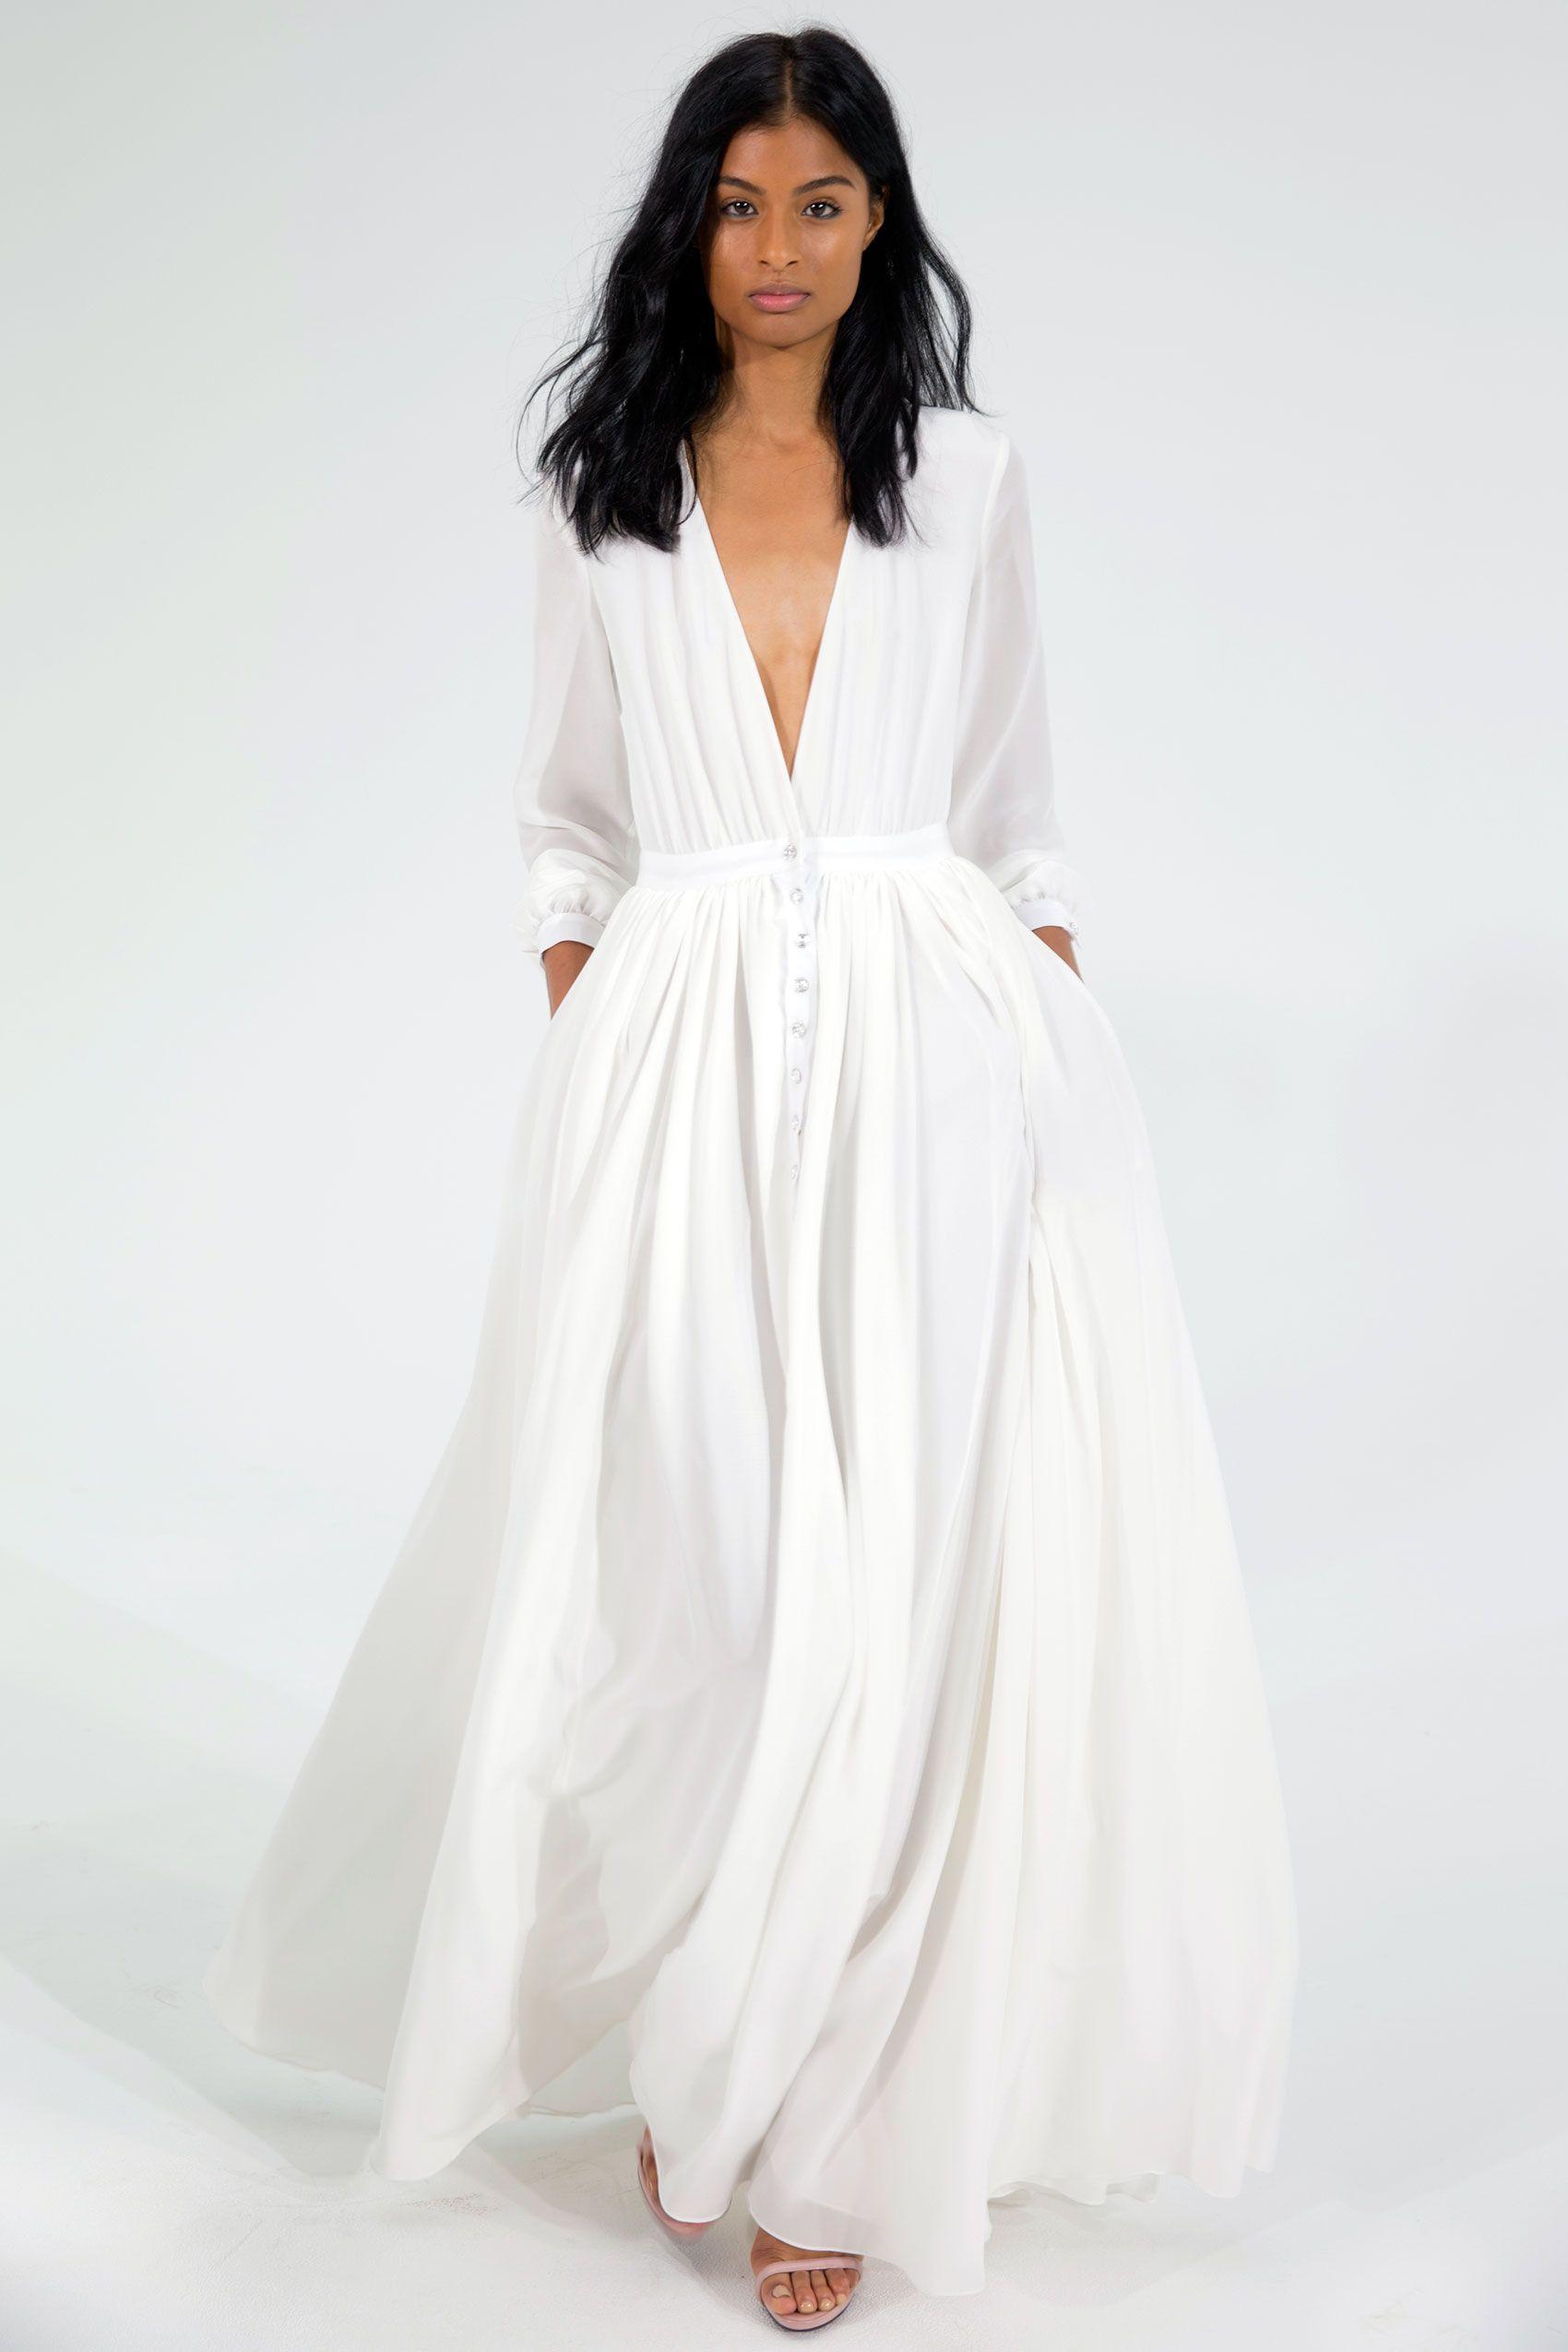 best looks bridal week fall fall wedding dresses